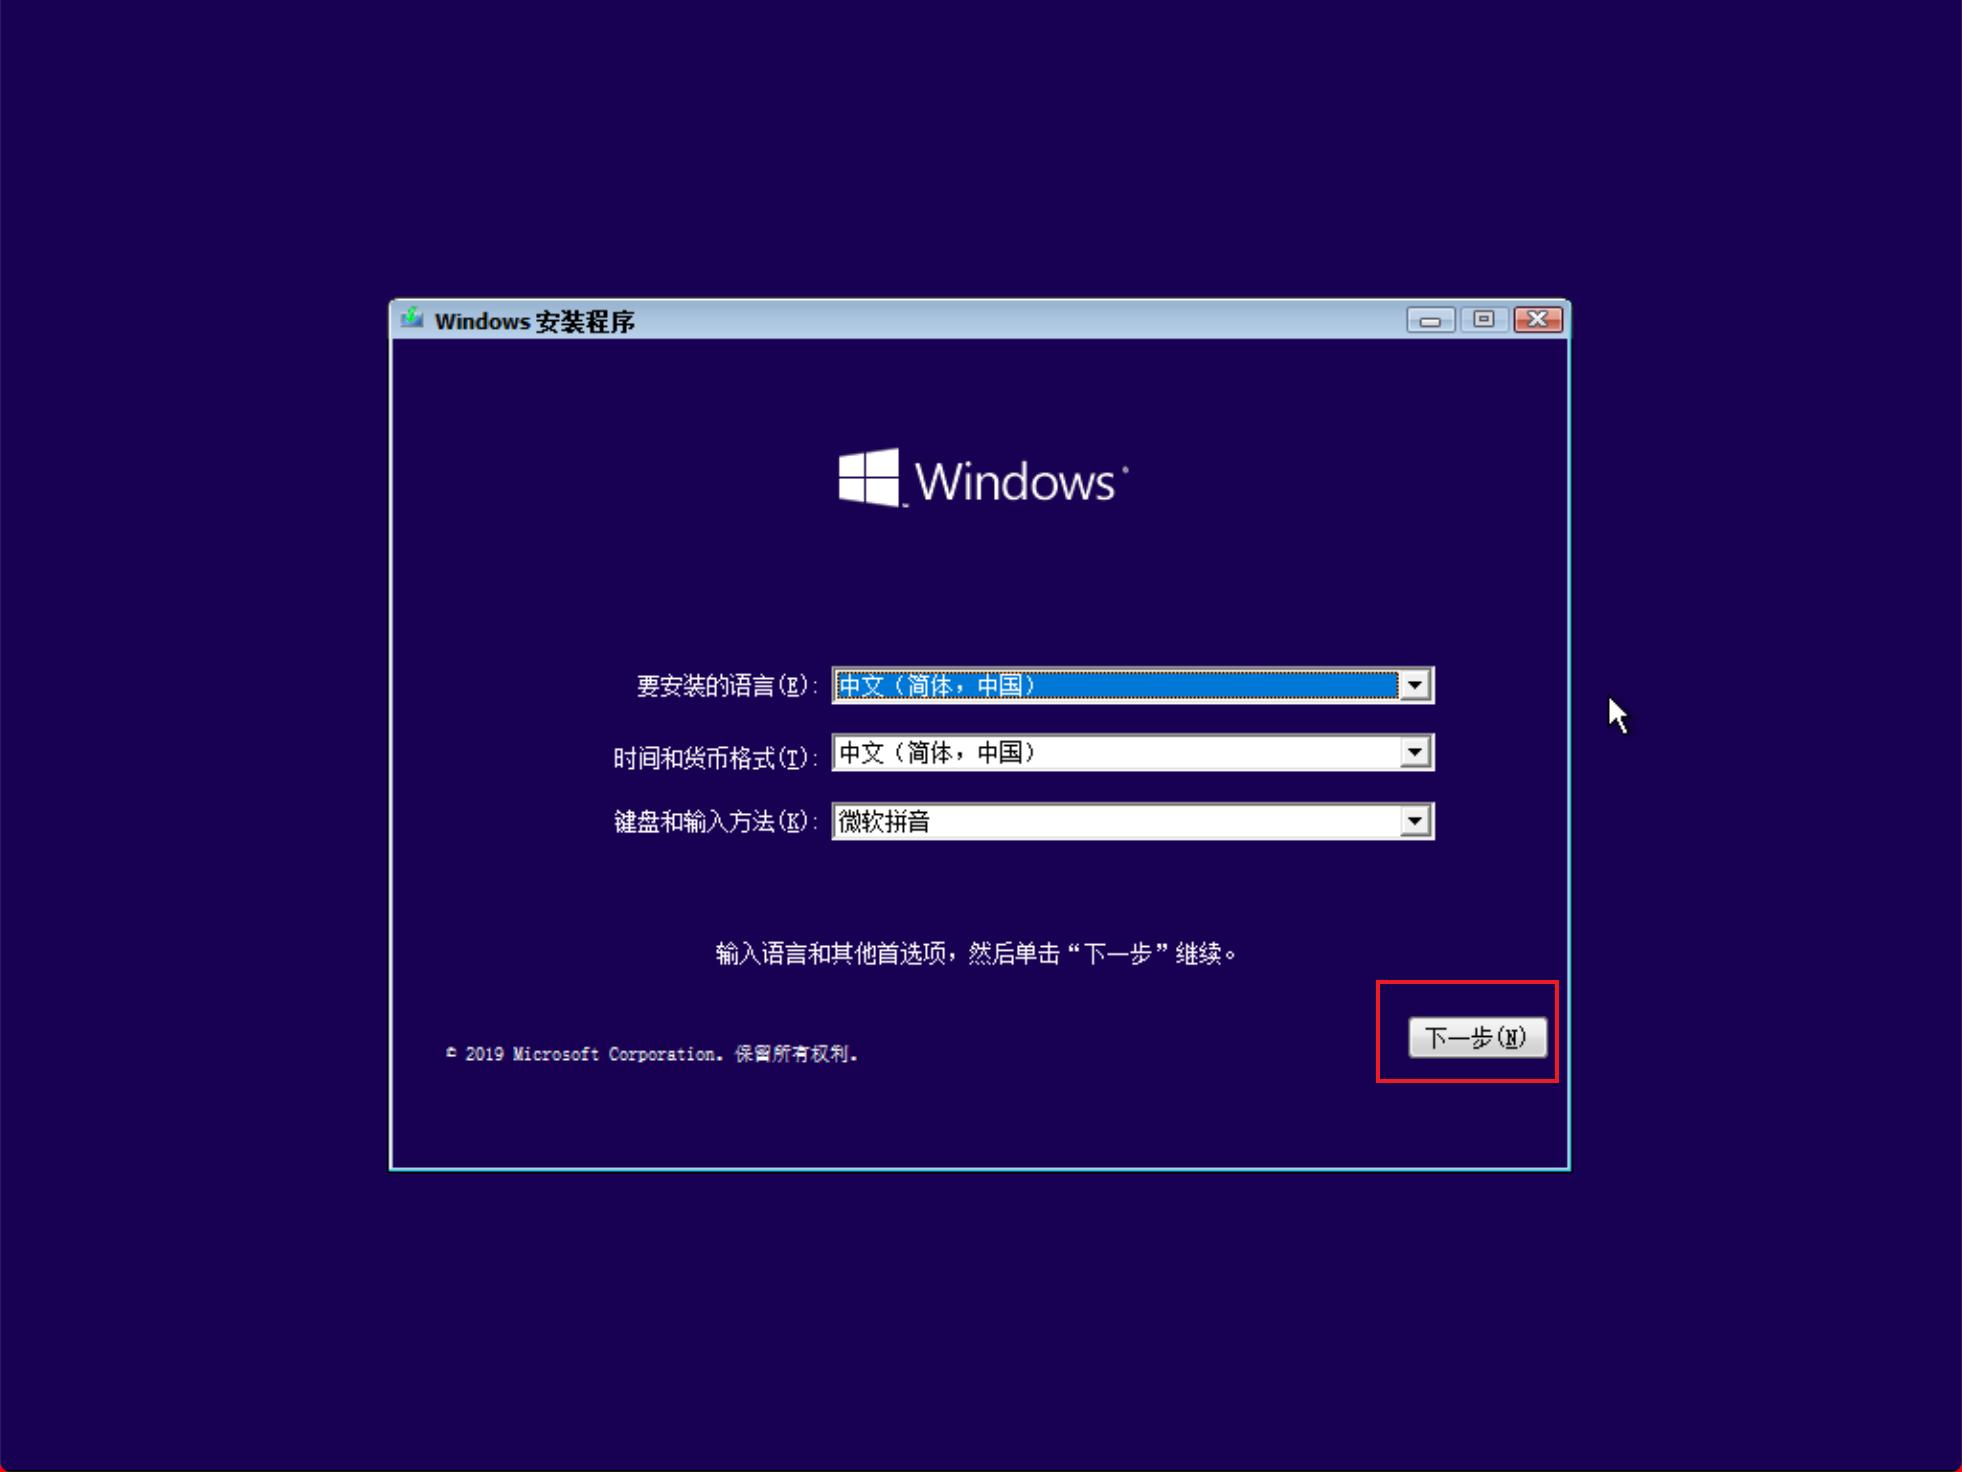 Windows 系统管理员密码忘记如何修改密码